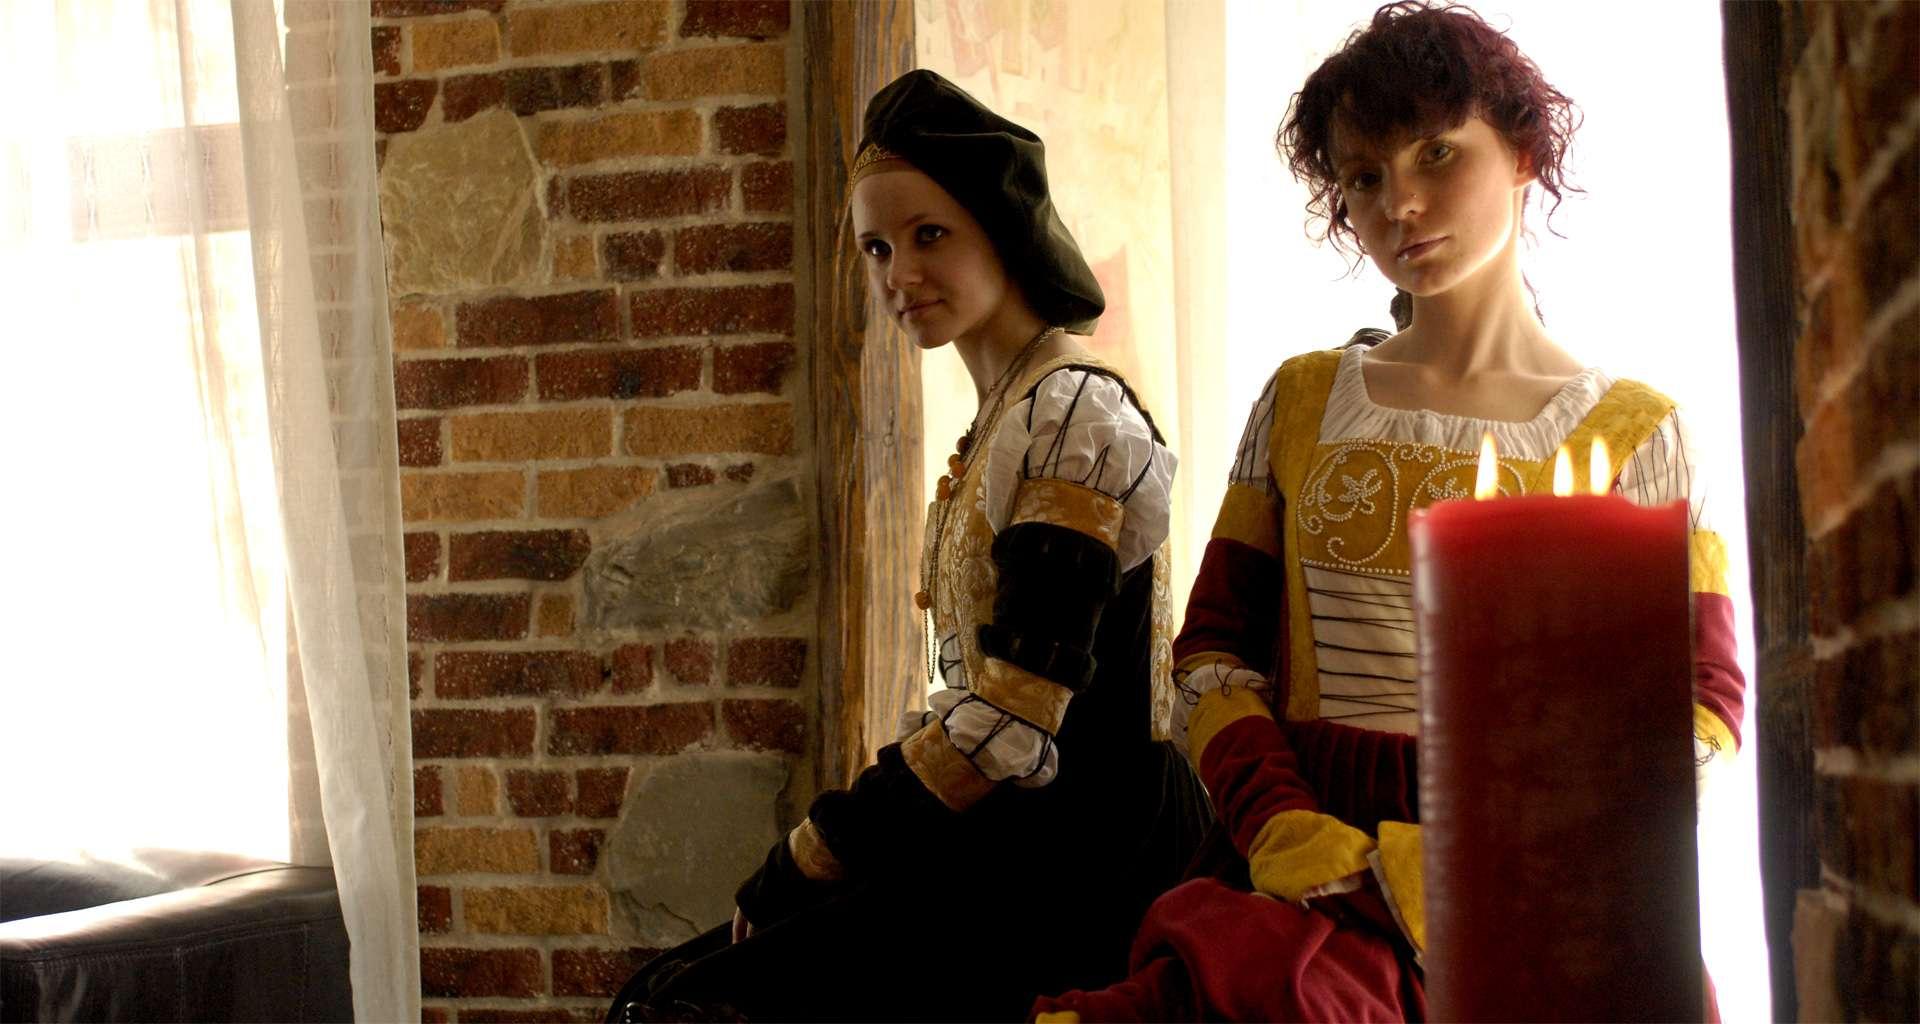 Medieval costumes for women in Vezha Vedmezha